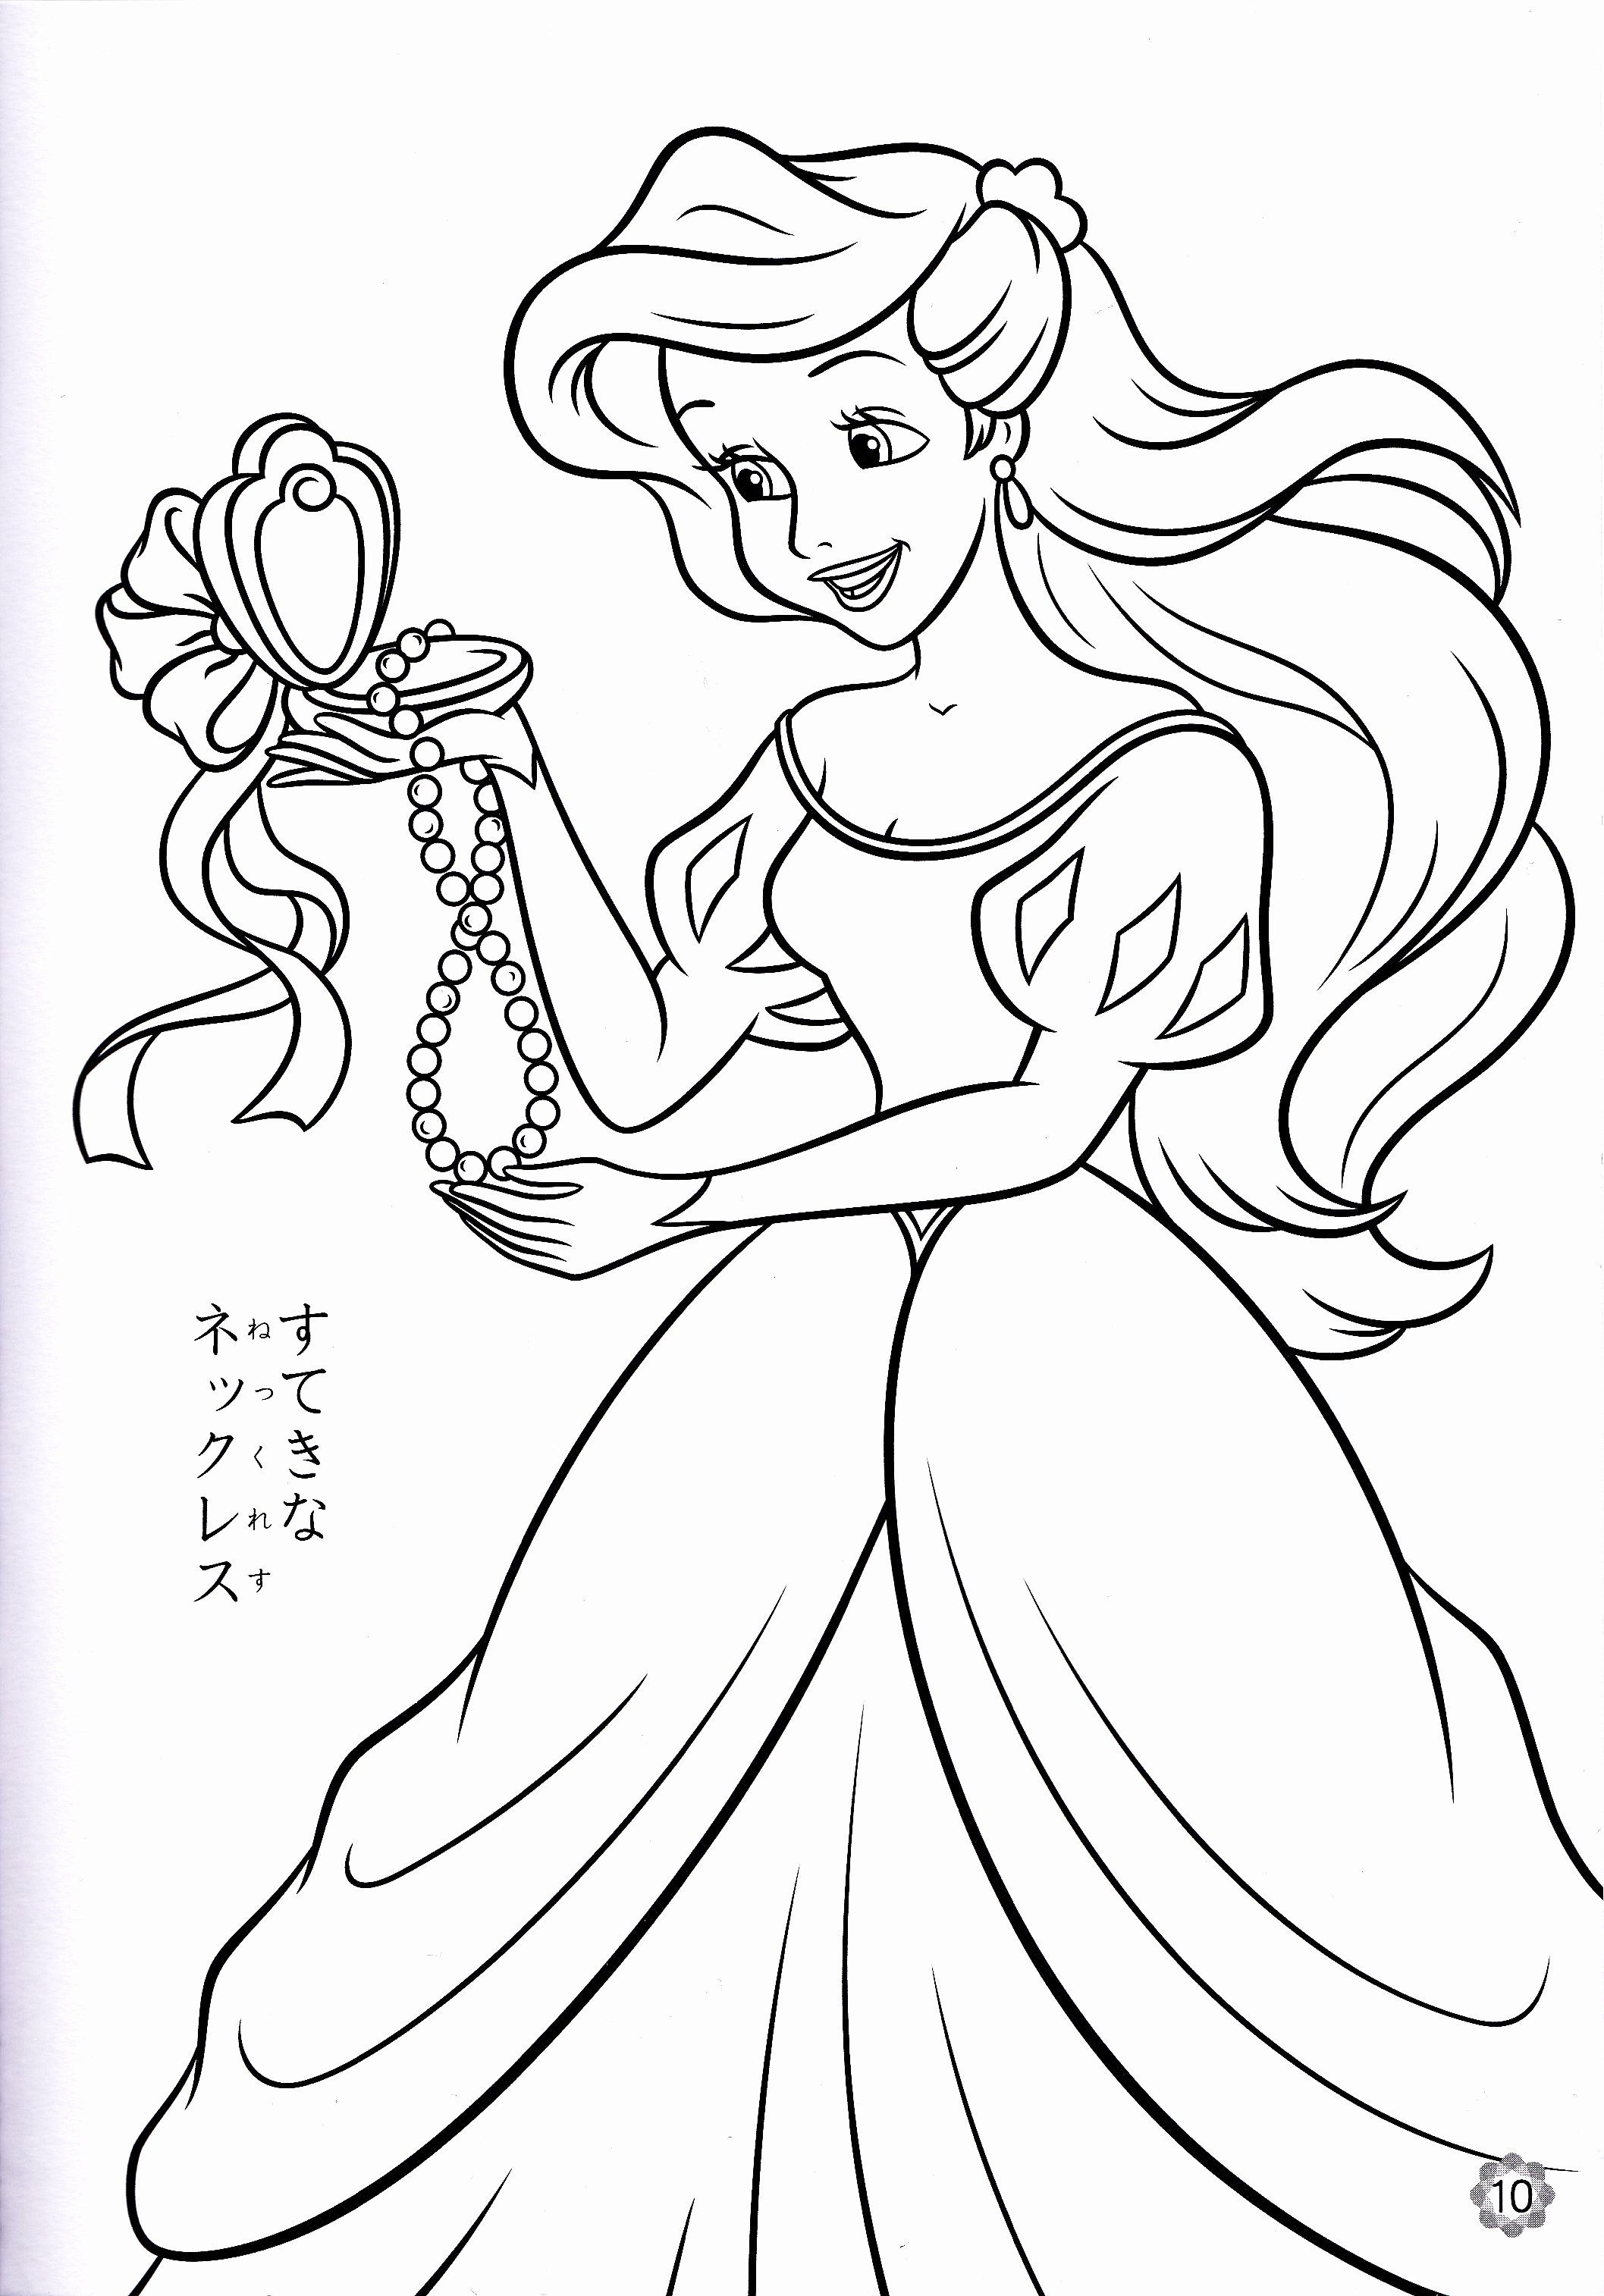 Little Princess Coloring Pages Luxury Coloring Excelent Ariel Printable Coloring Pages Ariel Coloring Pages Mermaid Coloring Pages Disney Coloring Sheets